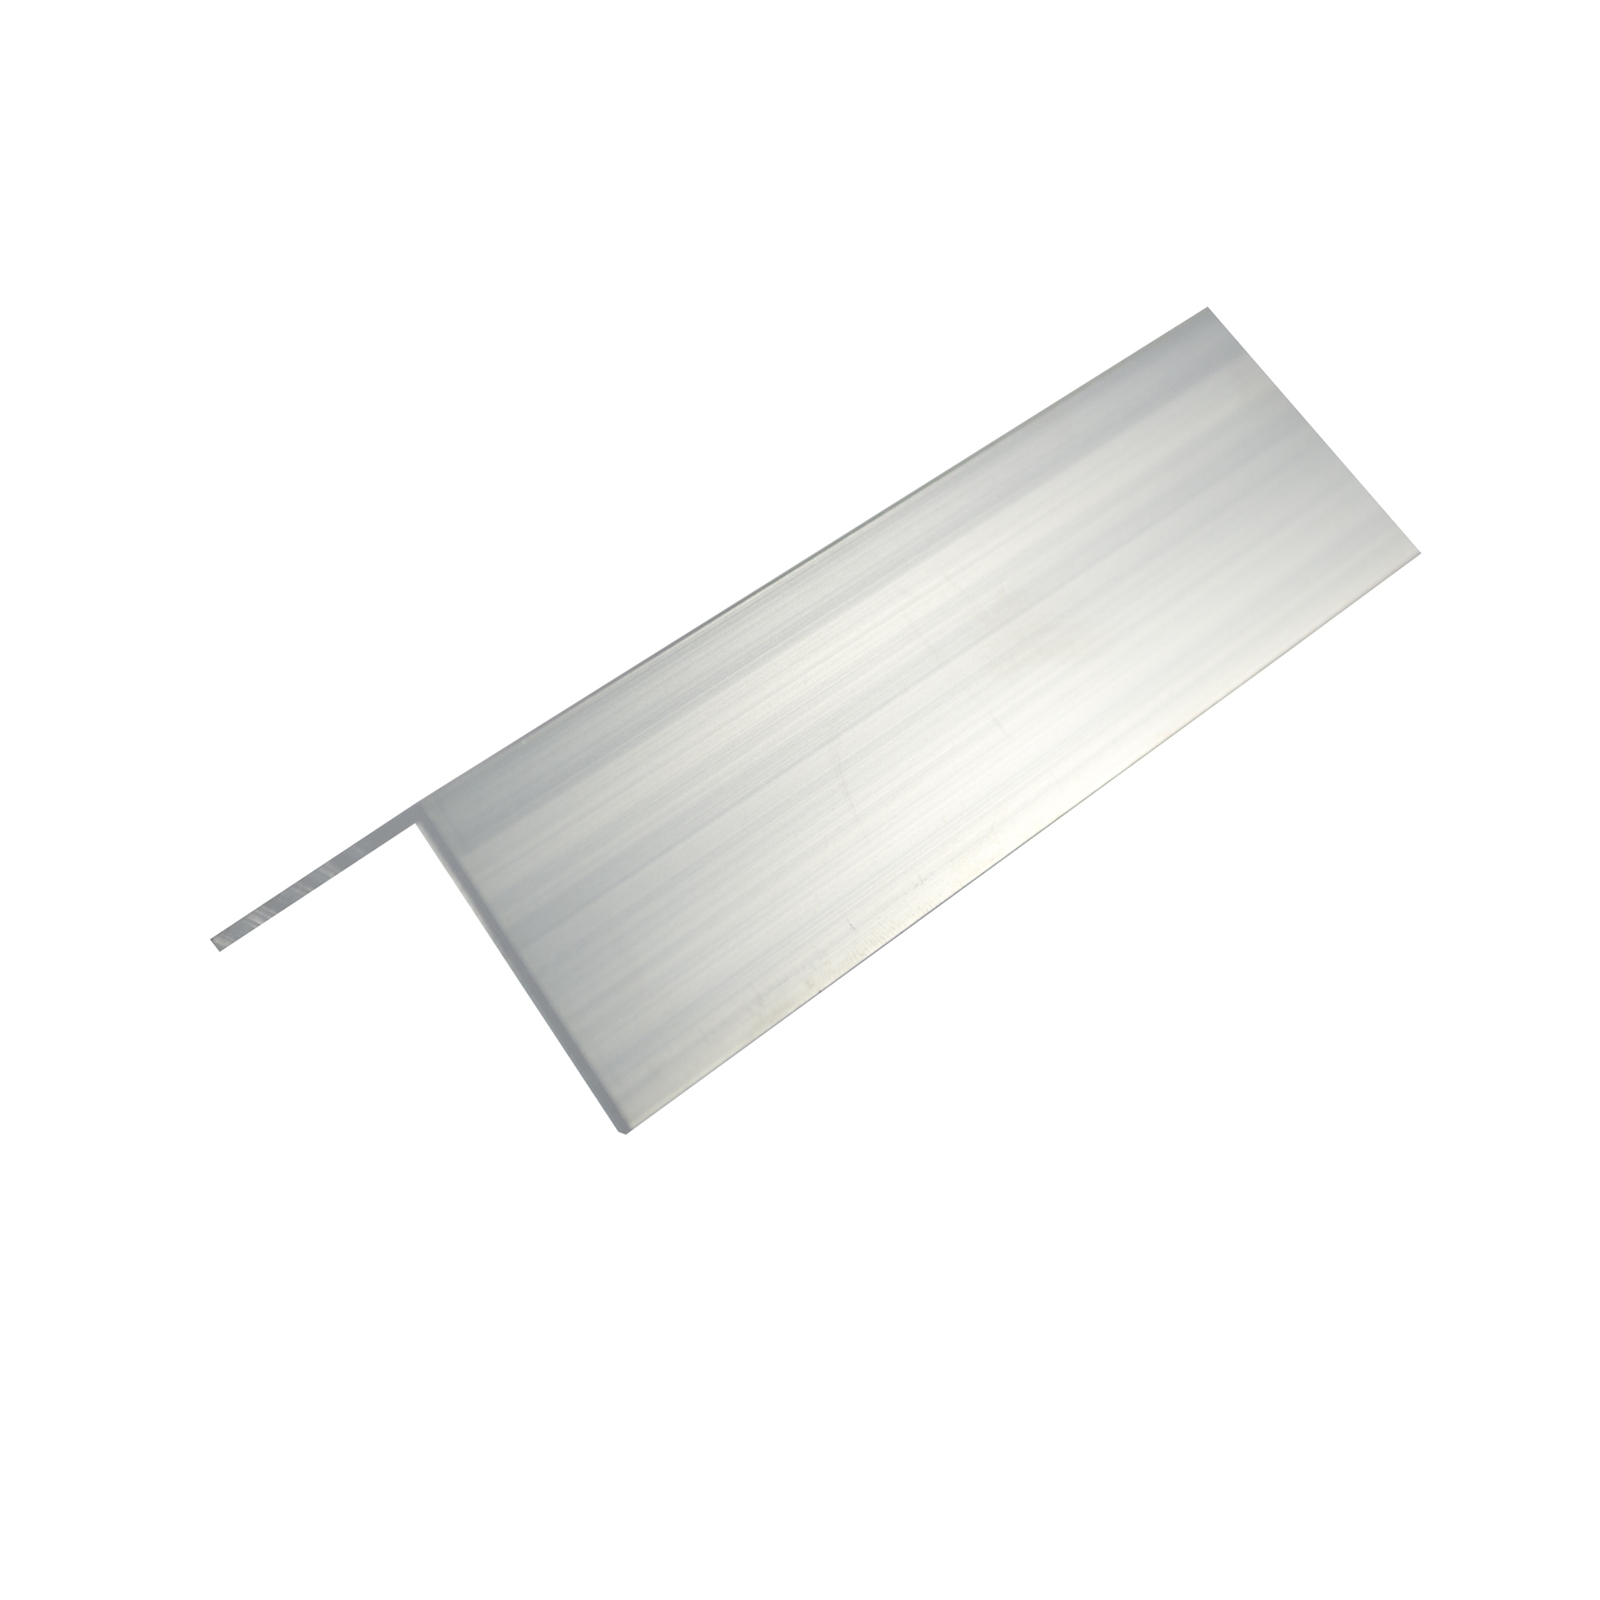 Metal Mate 20 x 20 x 3mm 3m Aluminium Equal Angle